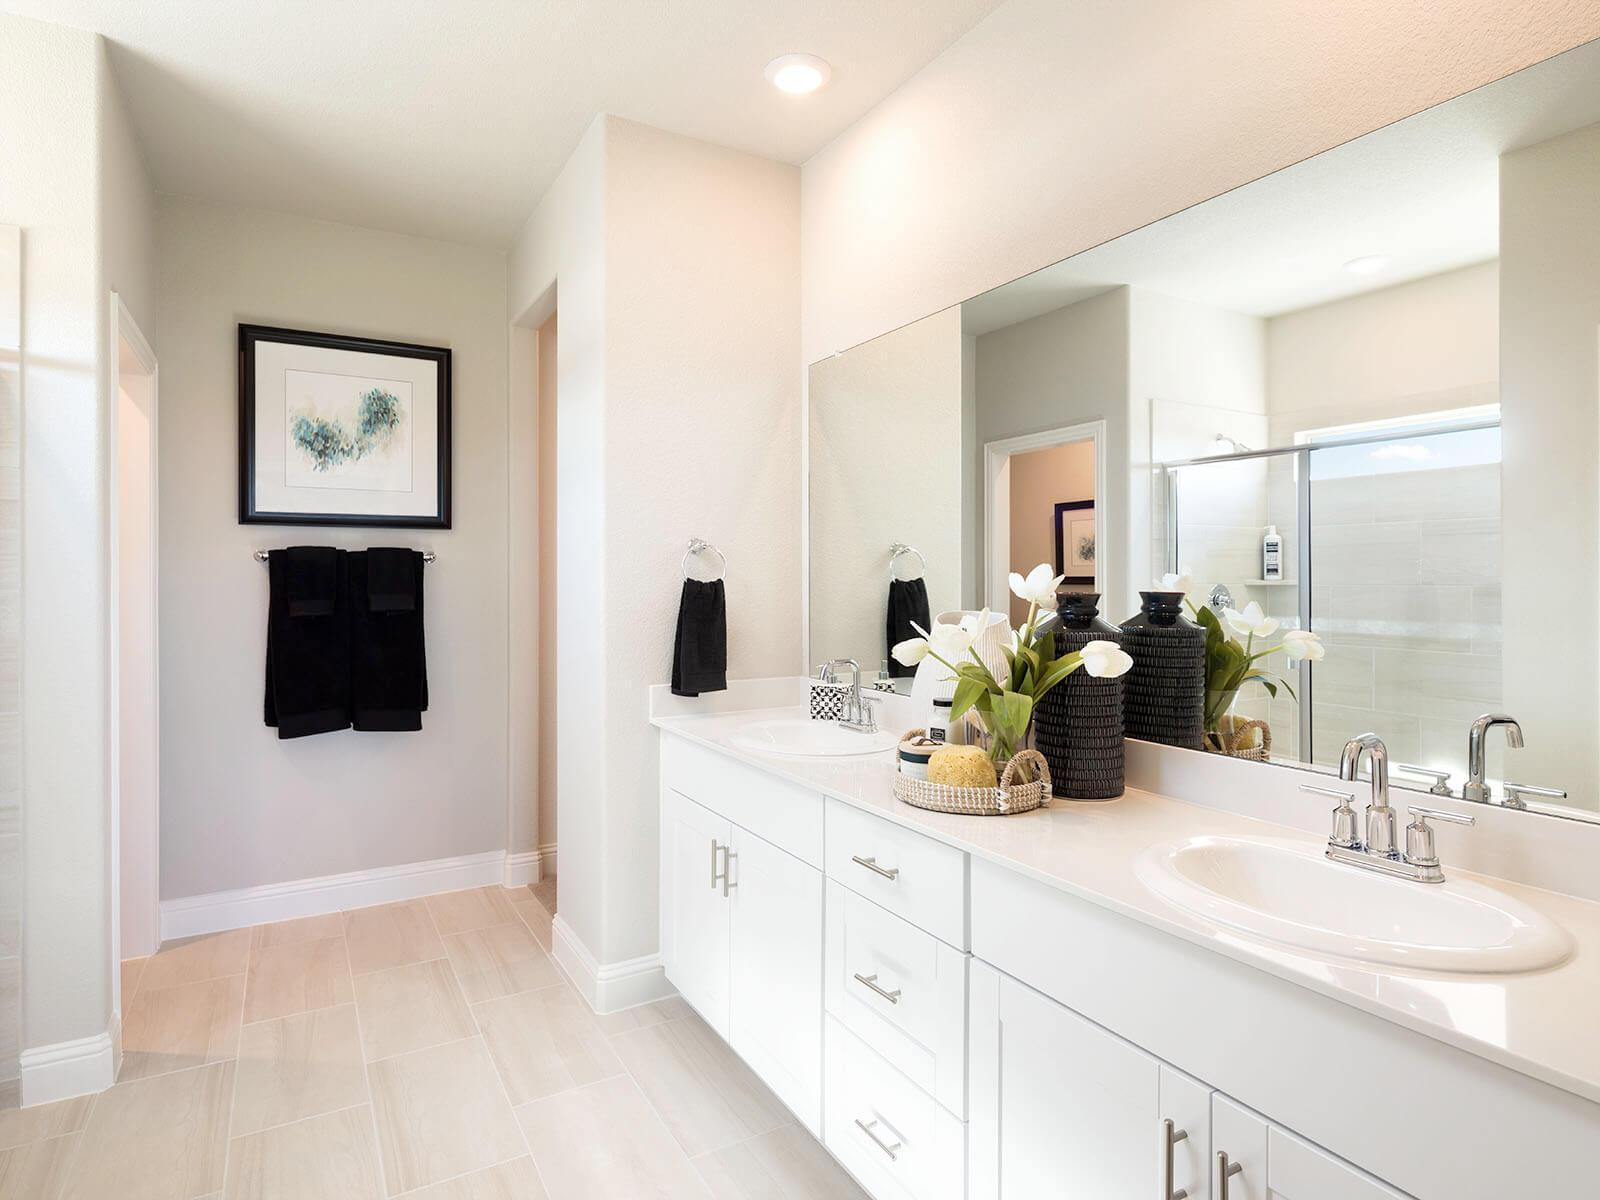 Bathroom featured in The Kessler By Meritage Homes in Dallas, TX